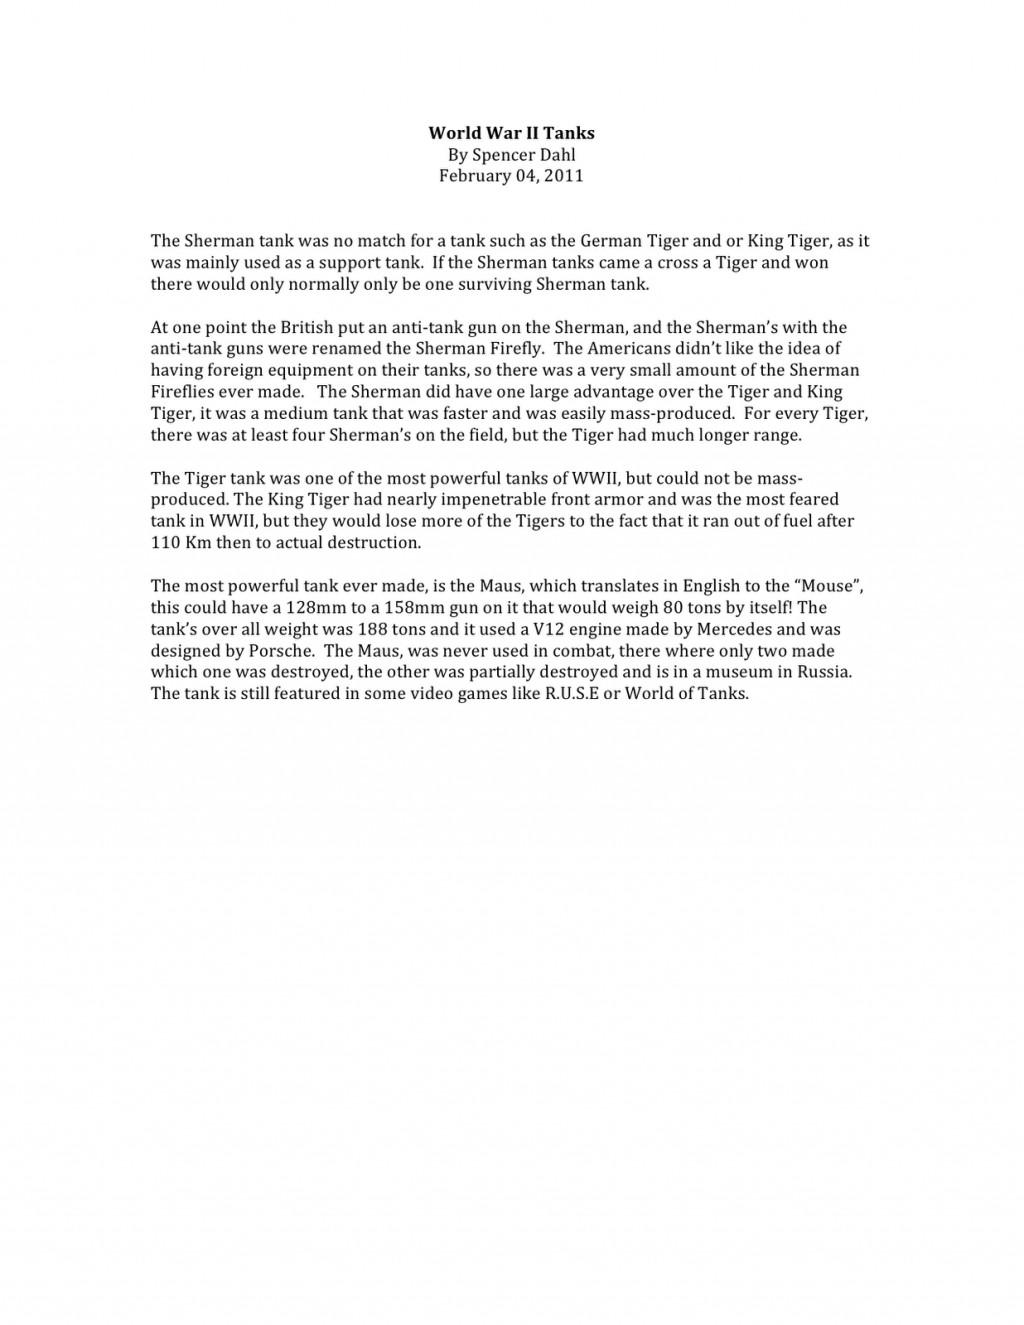 007 Short Essay World2bwar2bii2btanks Shocking Answer Rubric Apush About Slavery In America Questions Internal Medicine Large